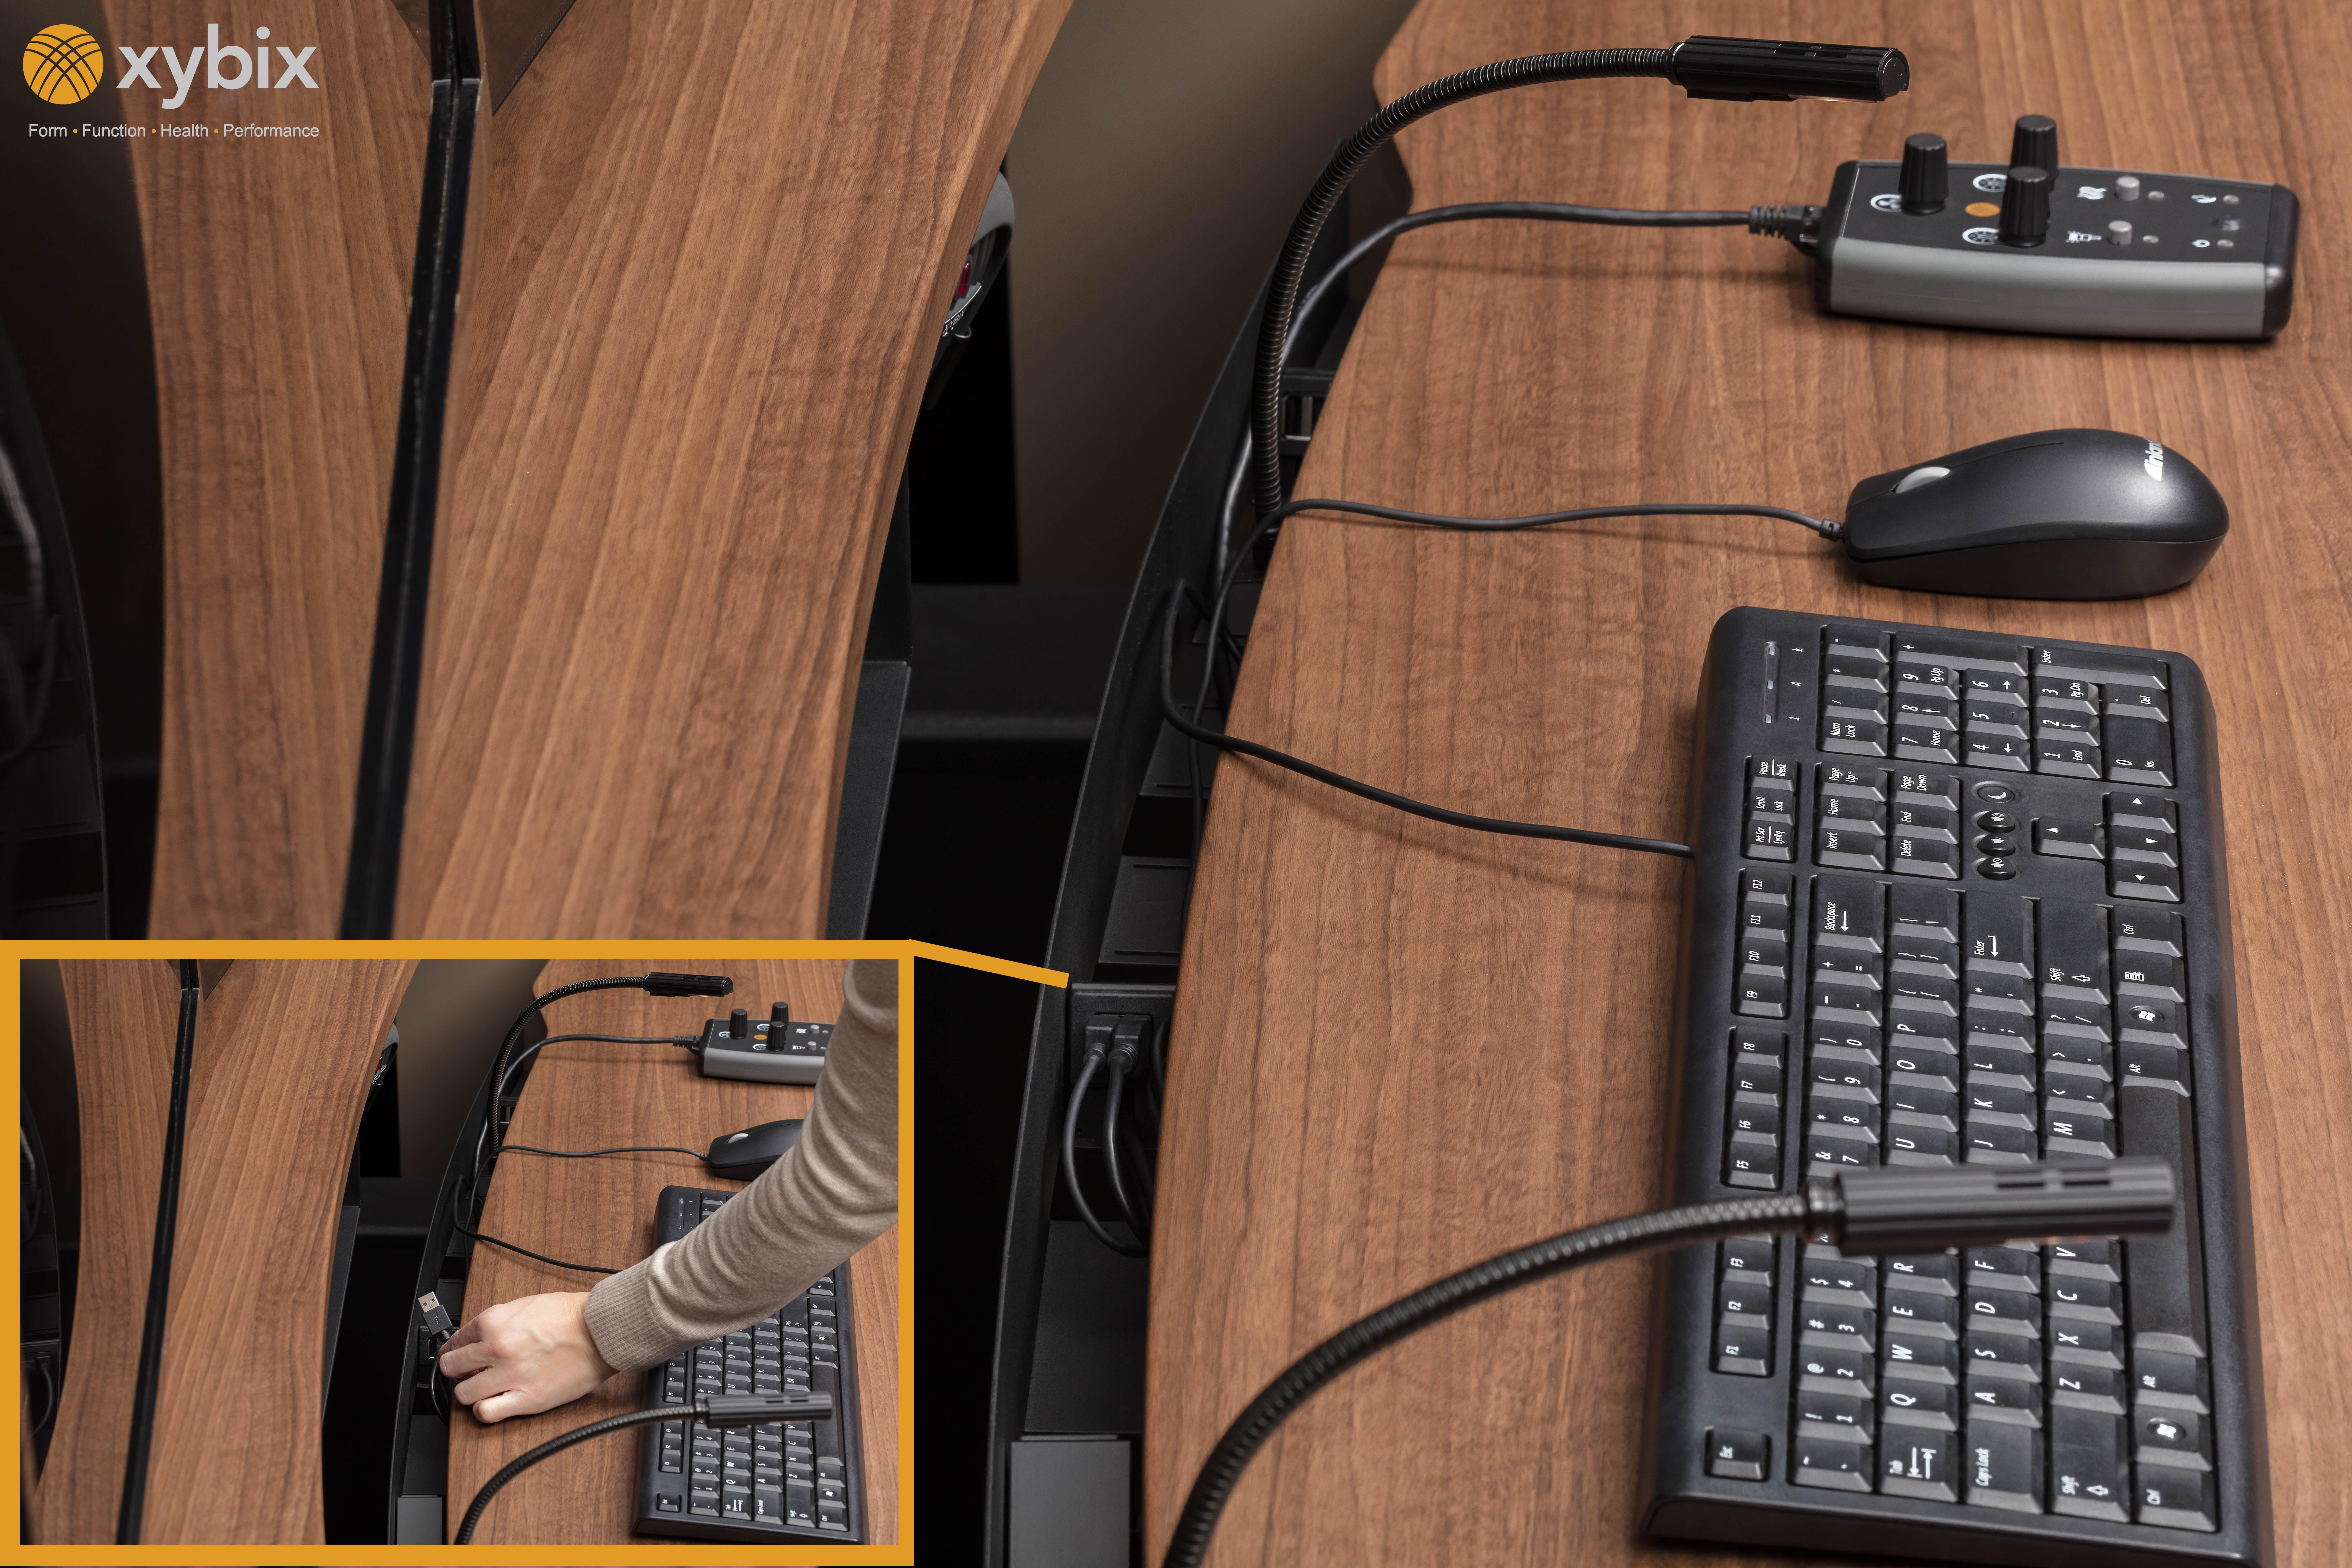 Dispatch Consoles | 911 Desks, Furniture | Xybix, Inc  | Xybix